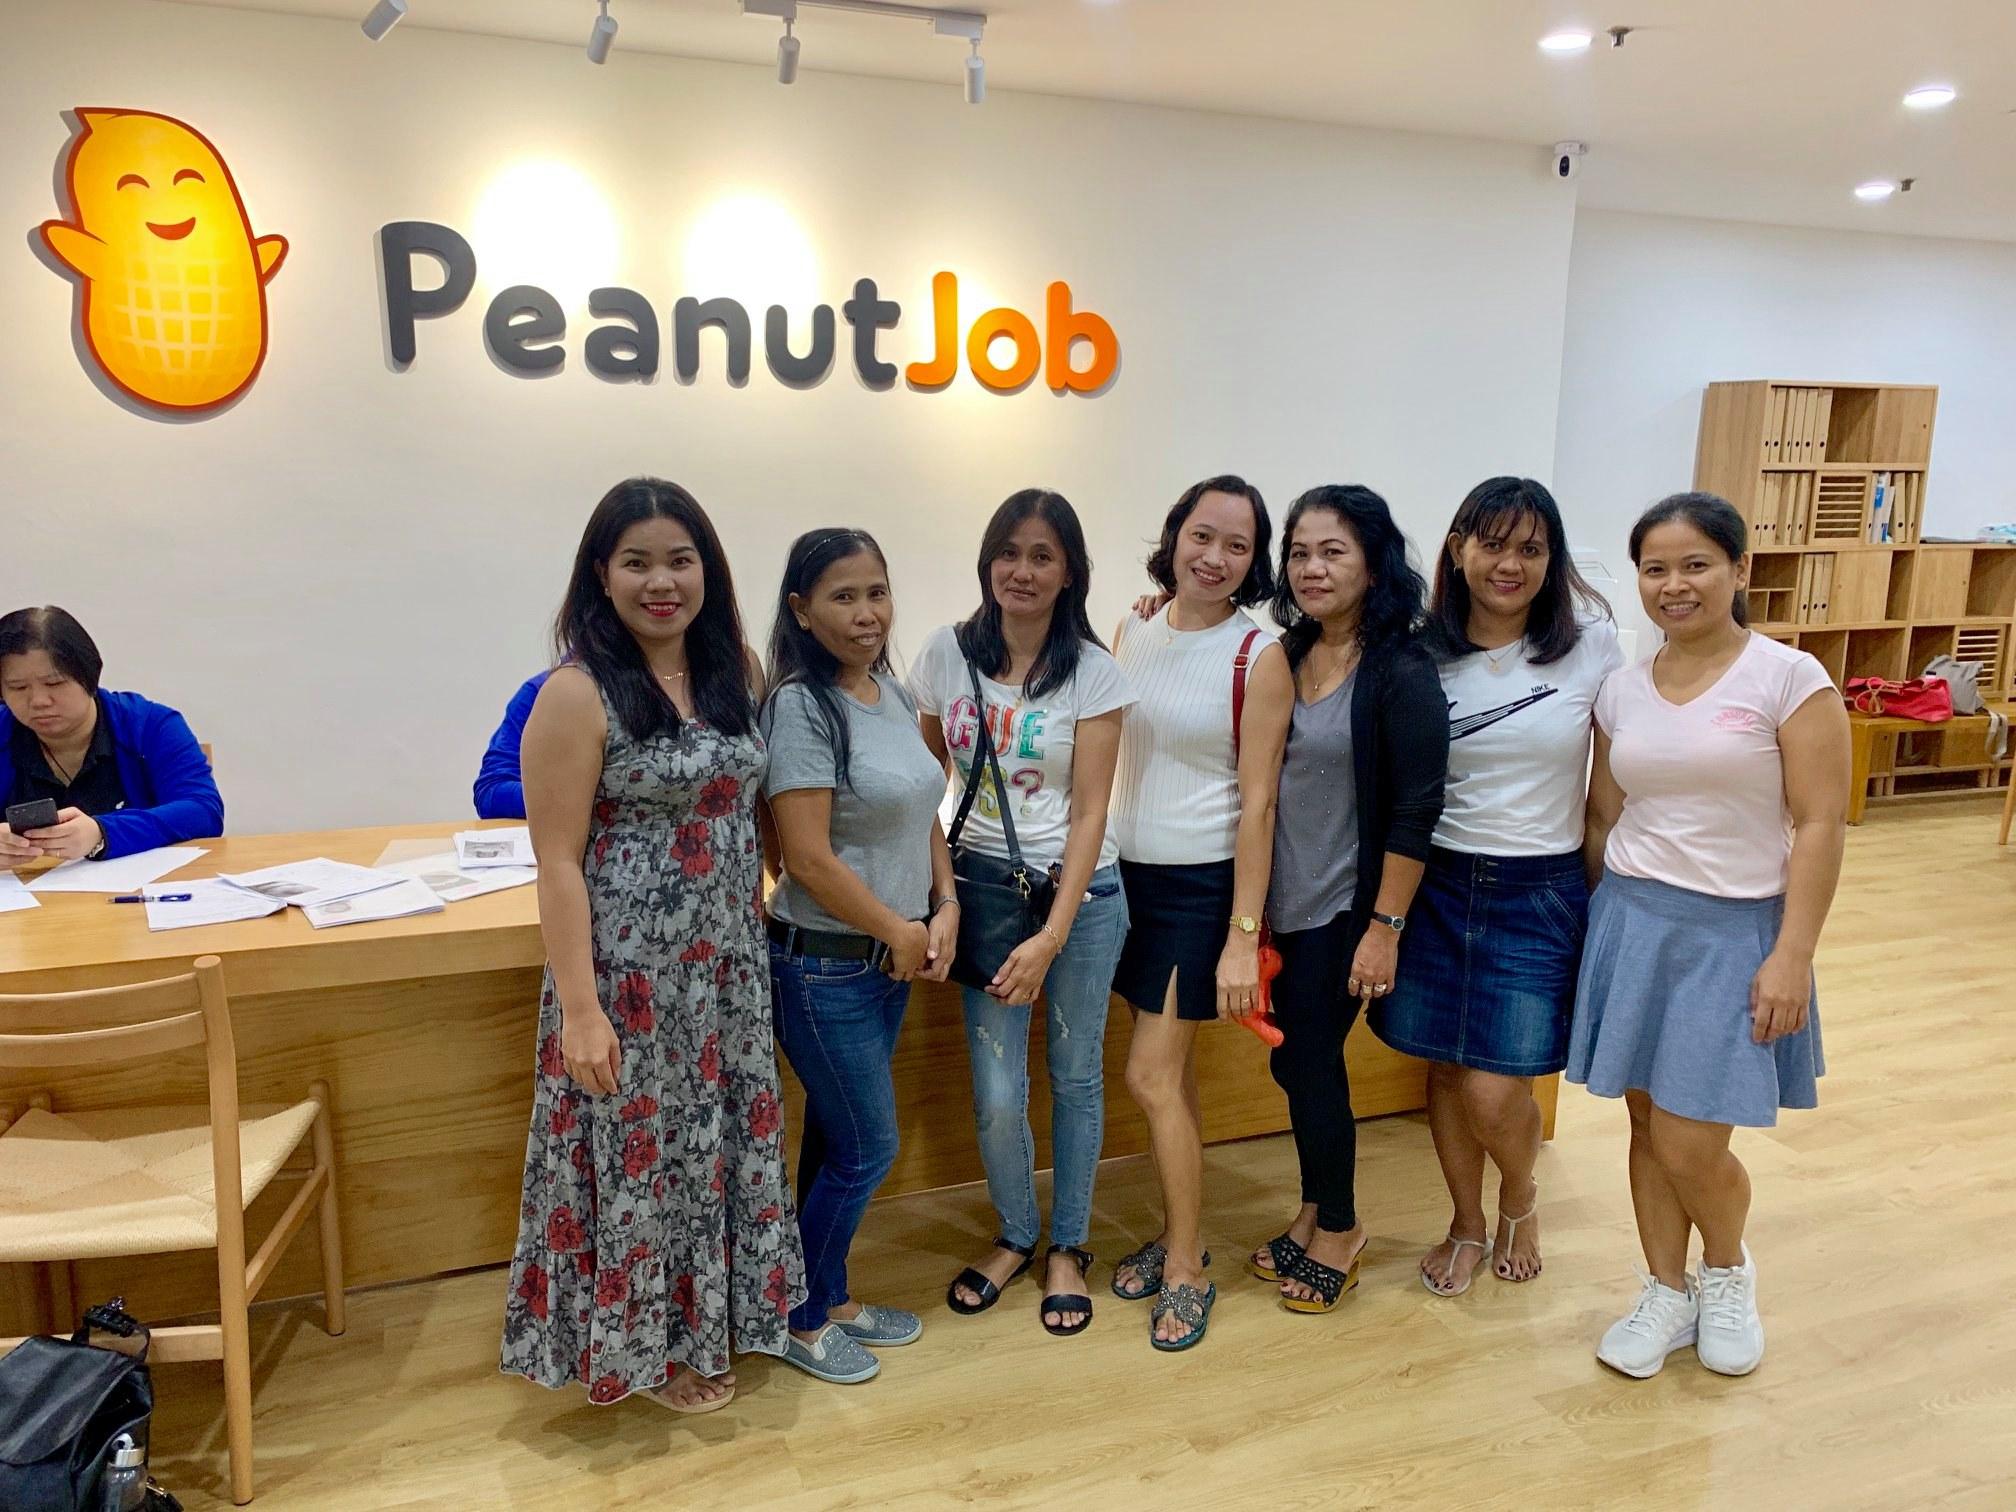 peanut job